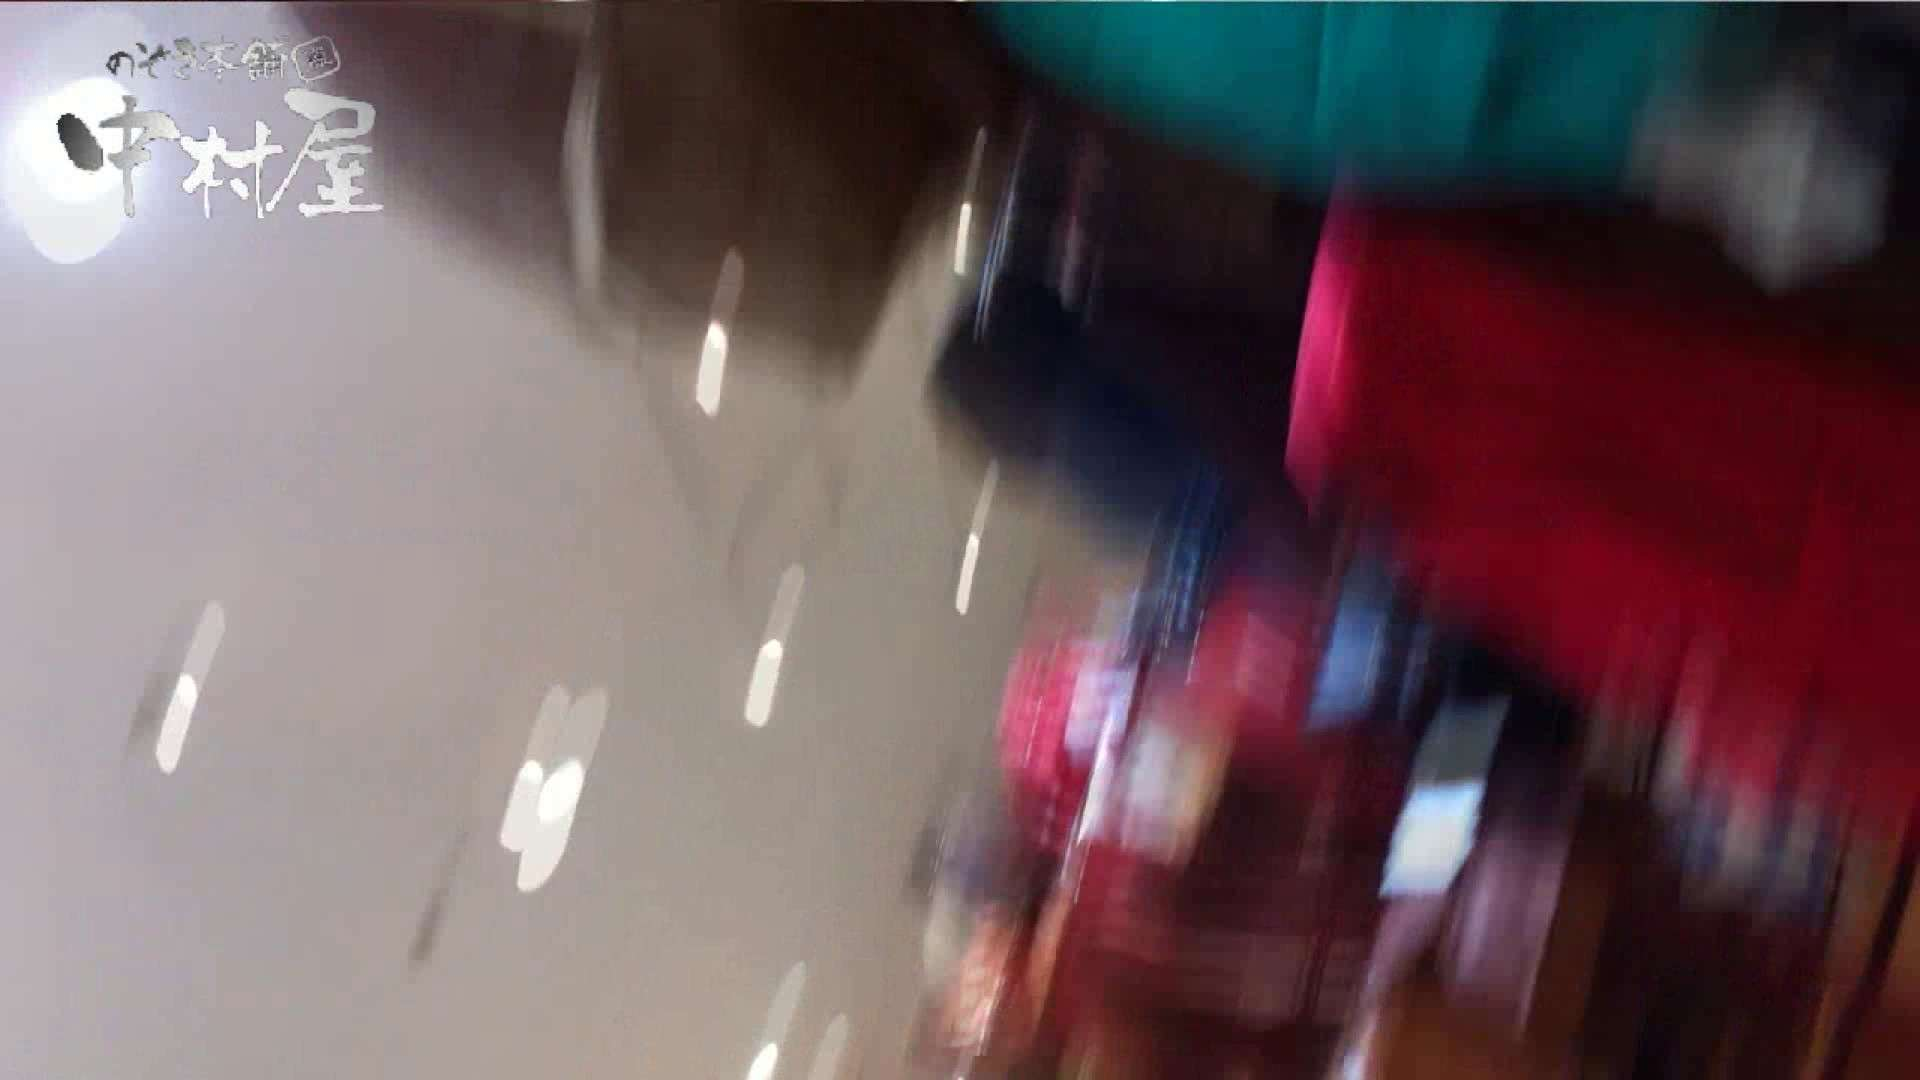 vol.52 美人アパレル胸チラ&パンチラ おとなしそうな店員の胸元にアタック! 美人  94Pix 50